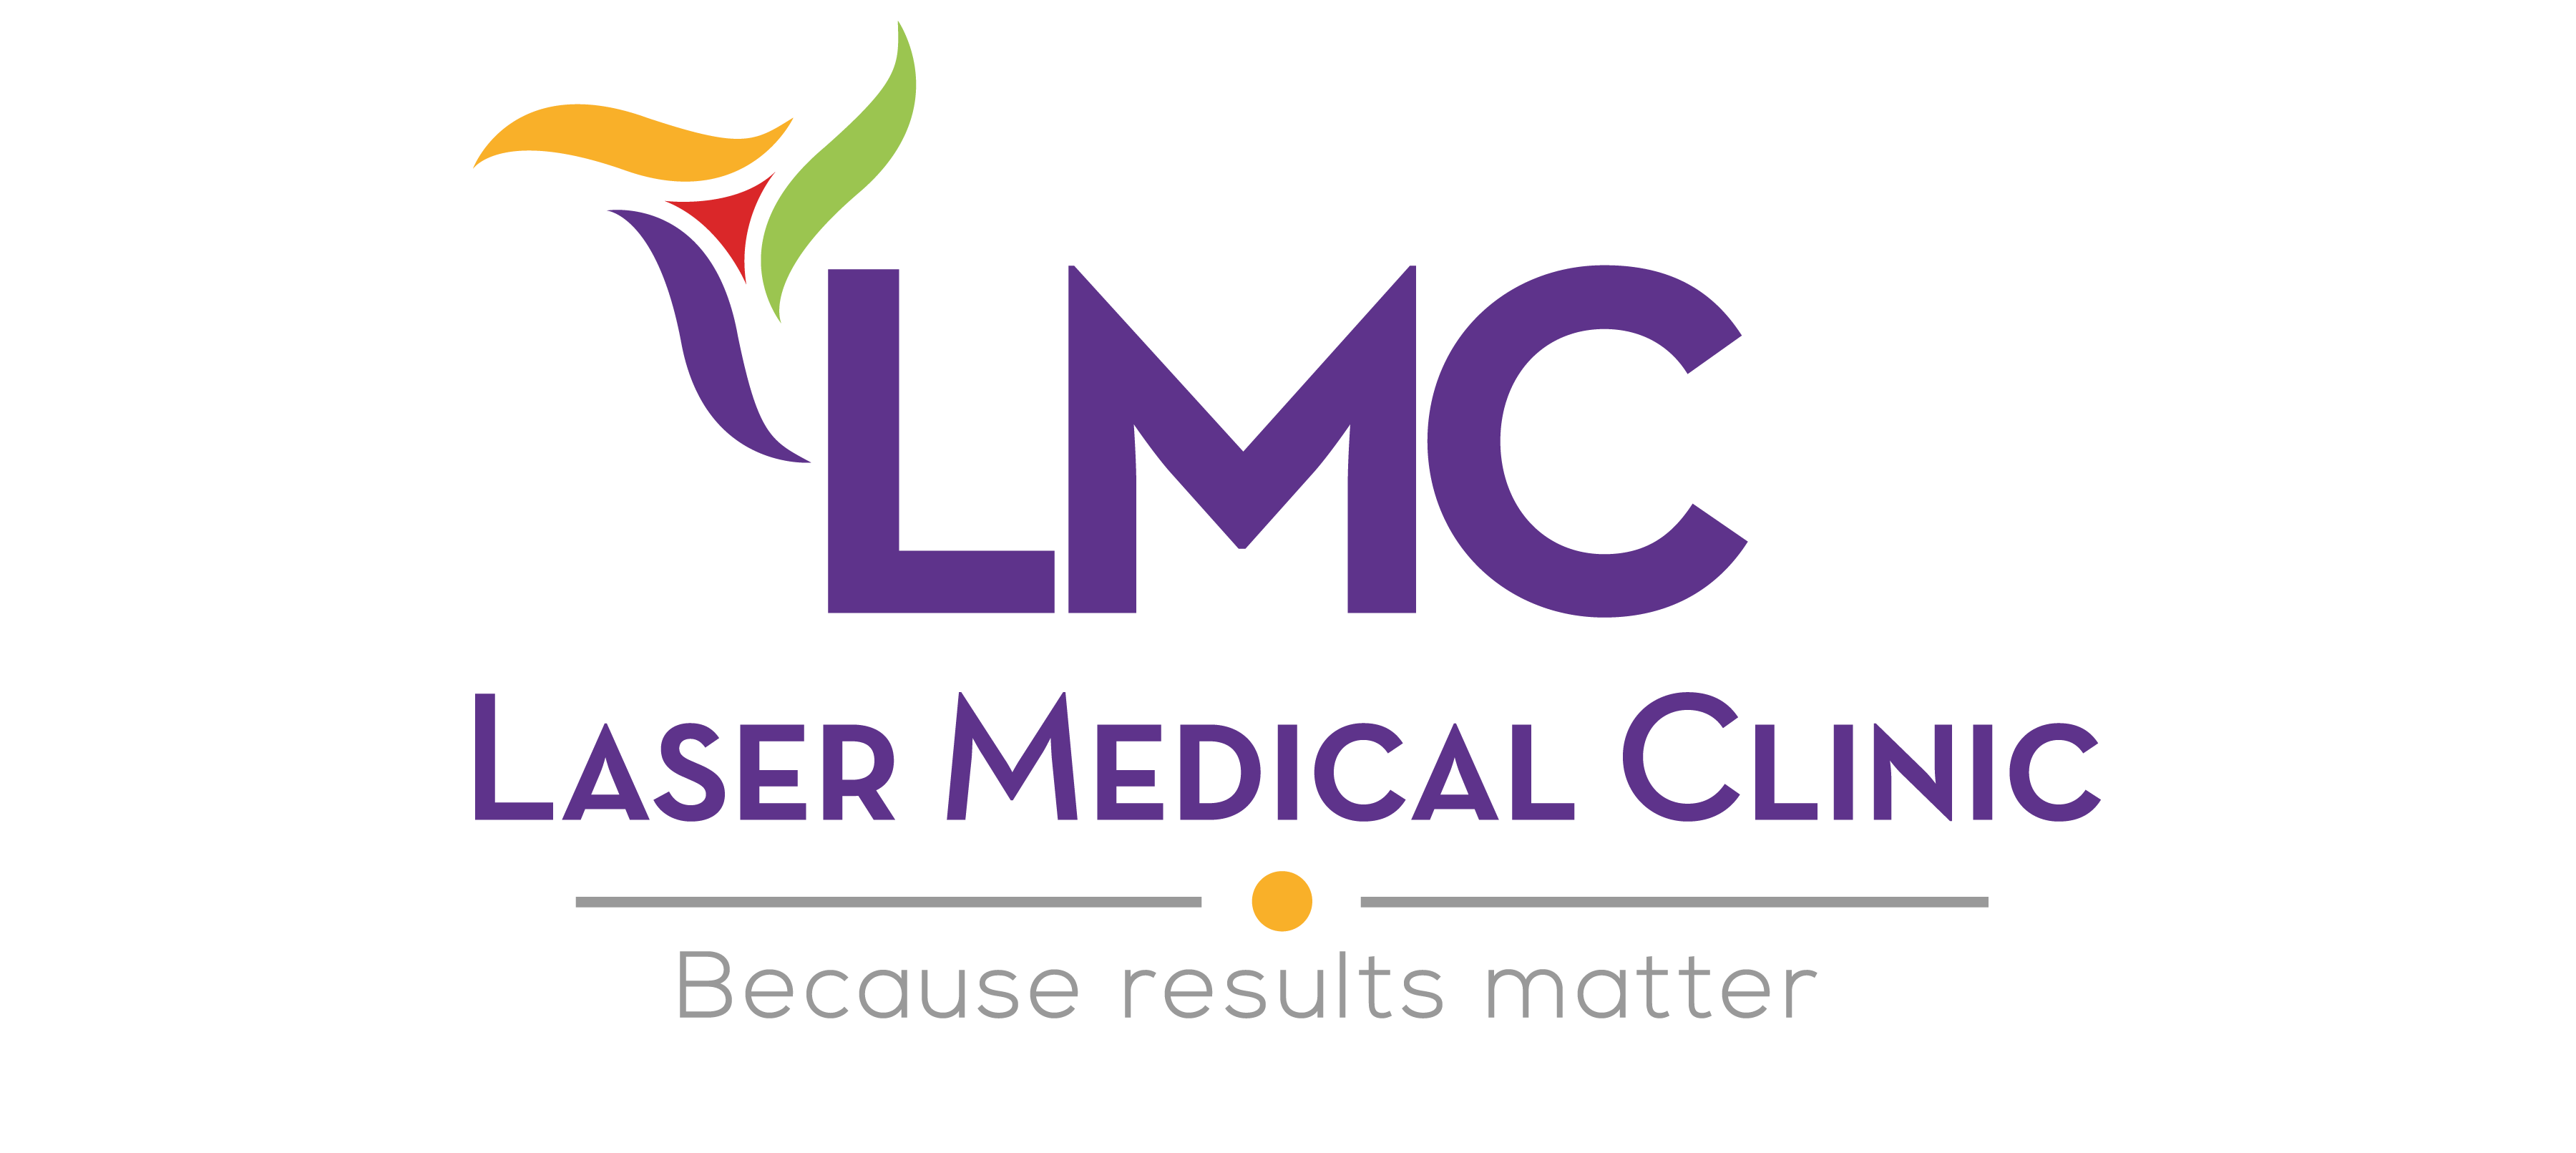 LMC – Laser Medical Clinic